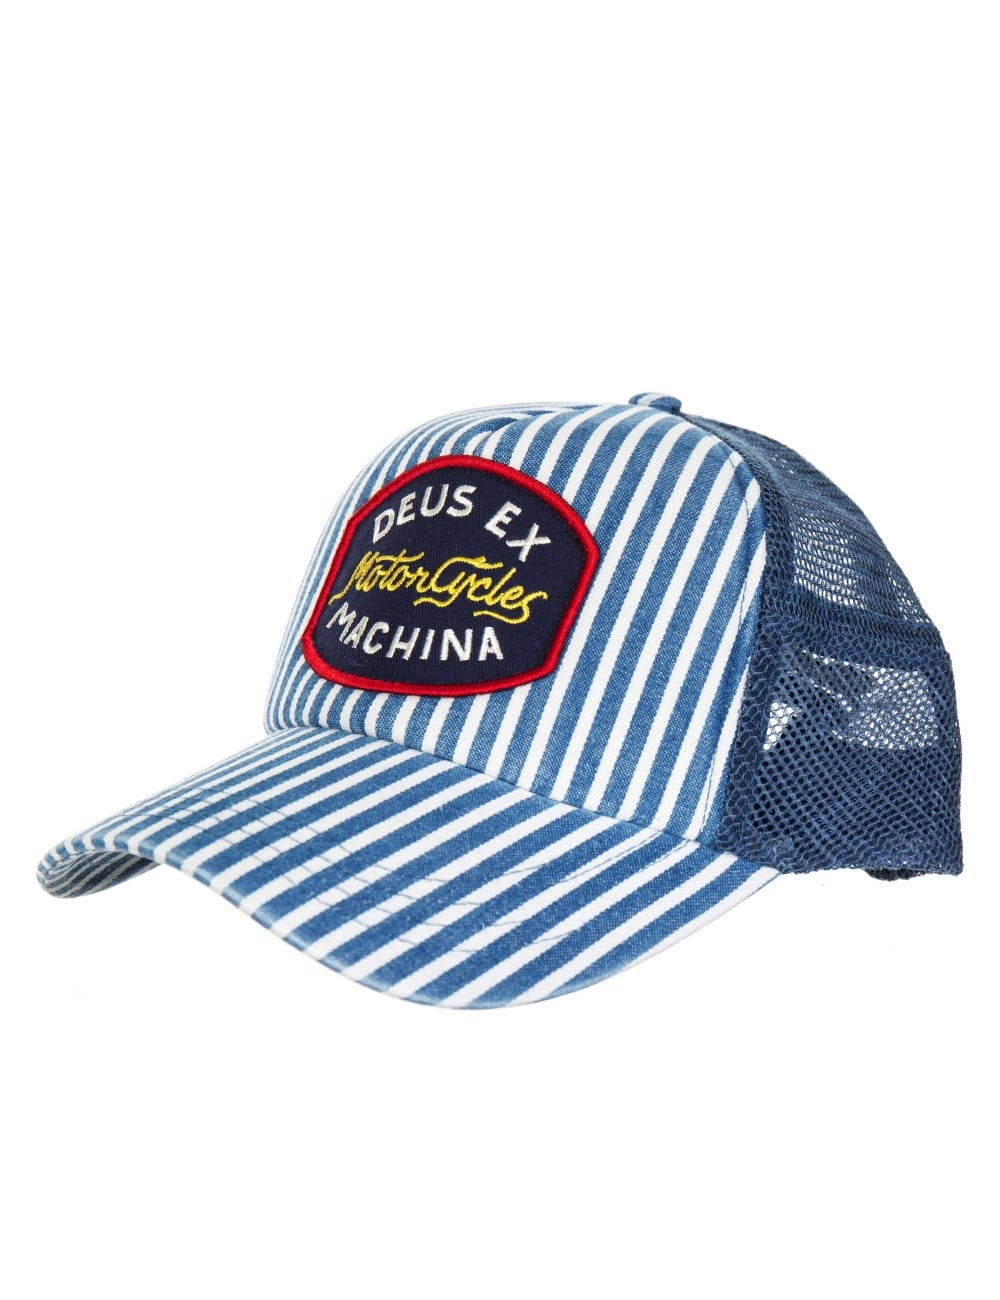 Deus Ex Machina Ford Trucker Hat - Indigo - Hat Shop from Fat Buddha ... 8ea8f0bc000